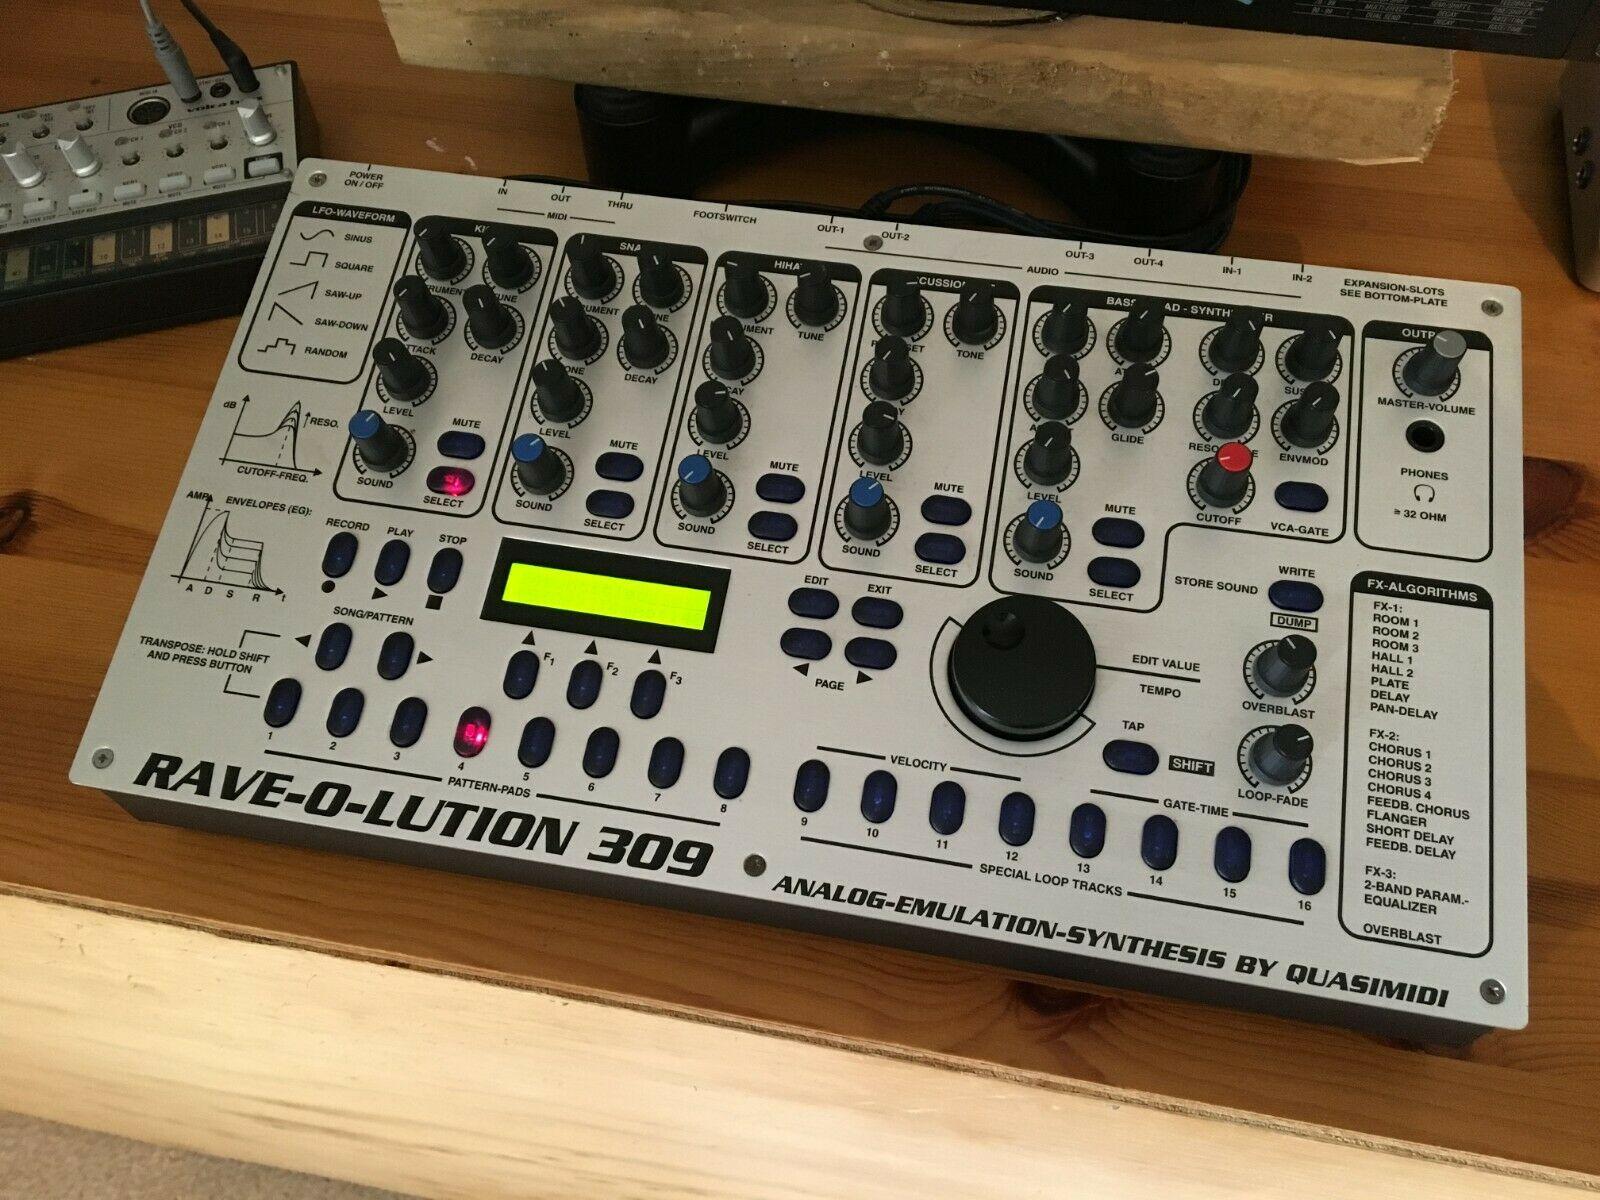 matrixsynth quasimidi 309 rave o lution drum machine seqencer synth expanded